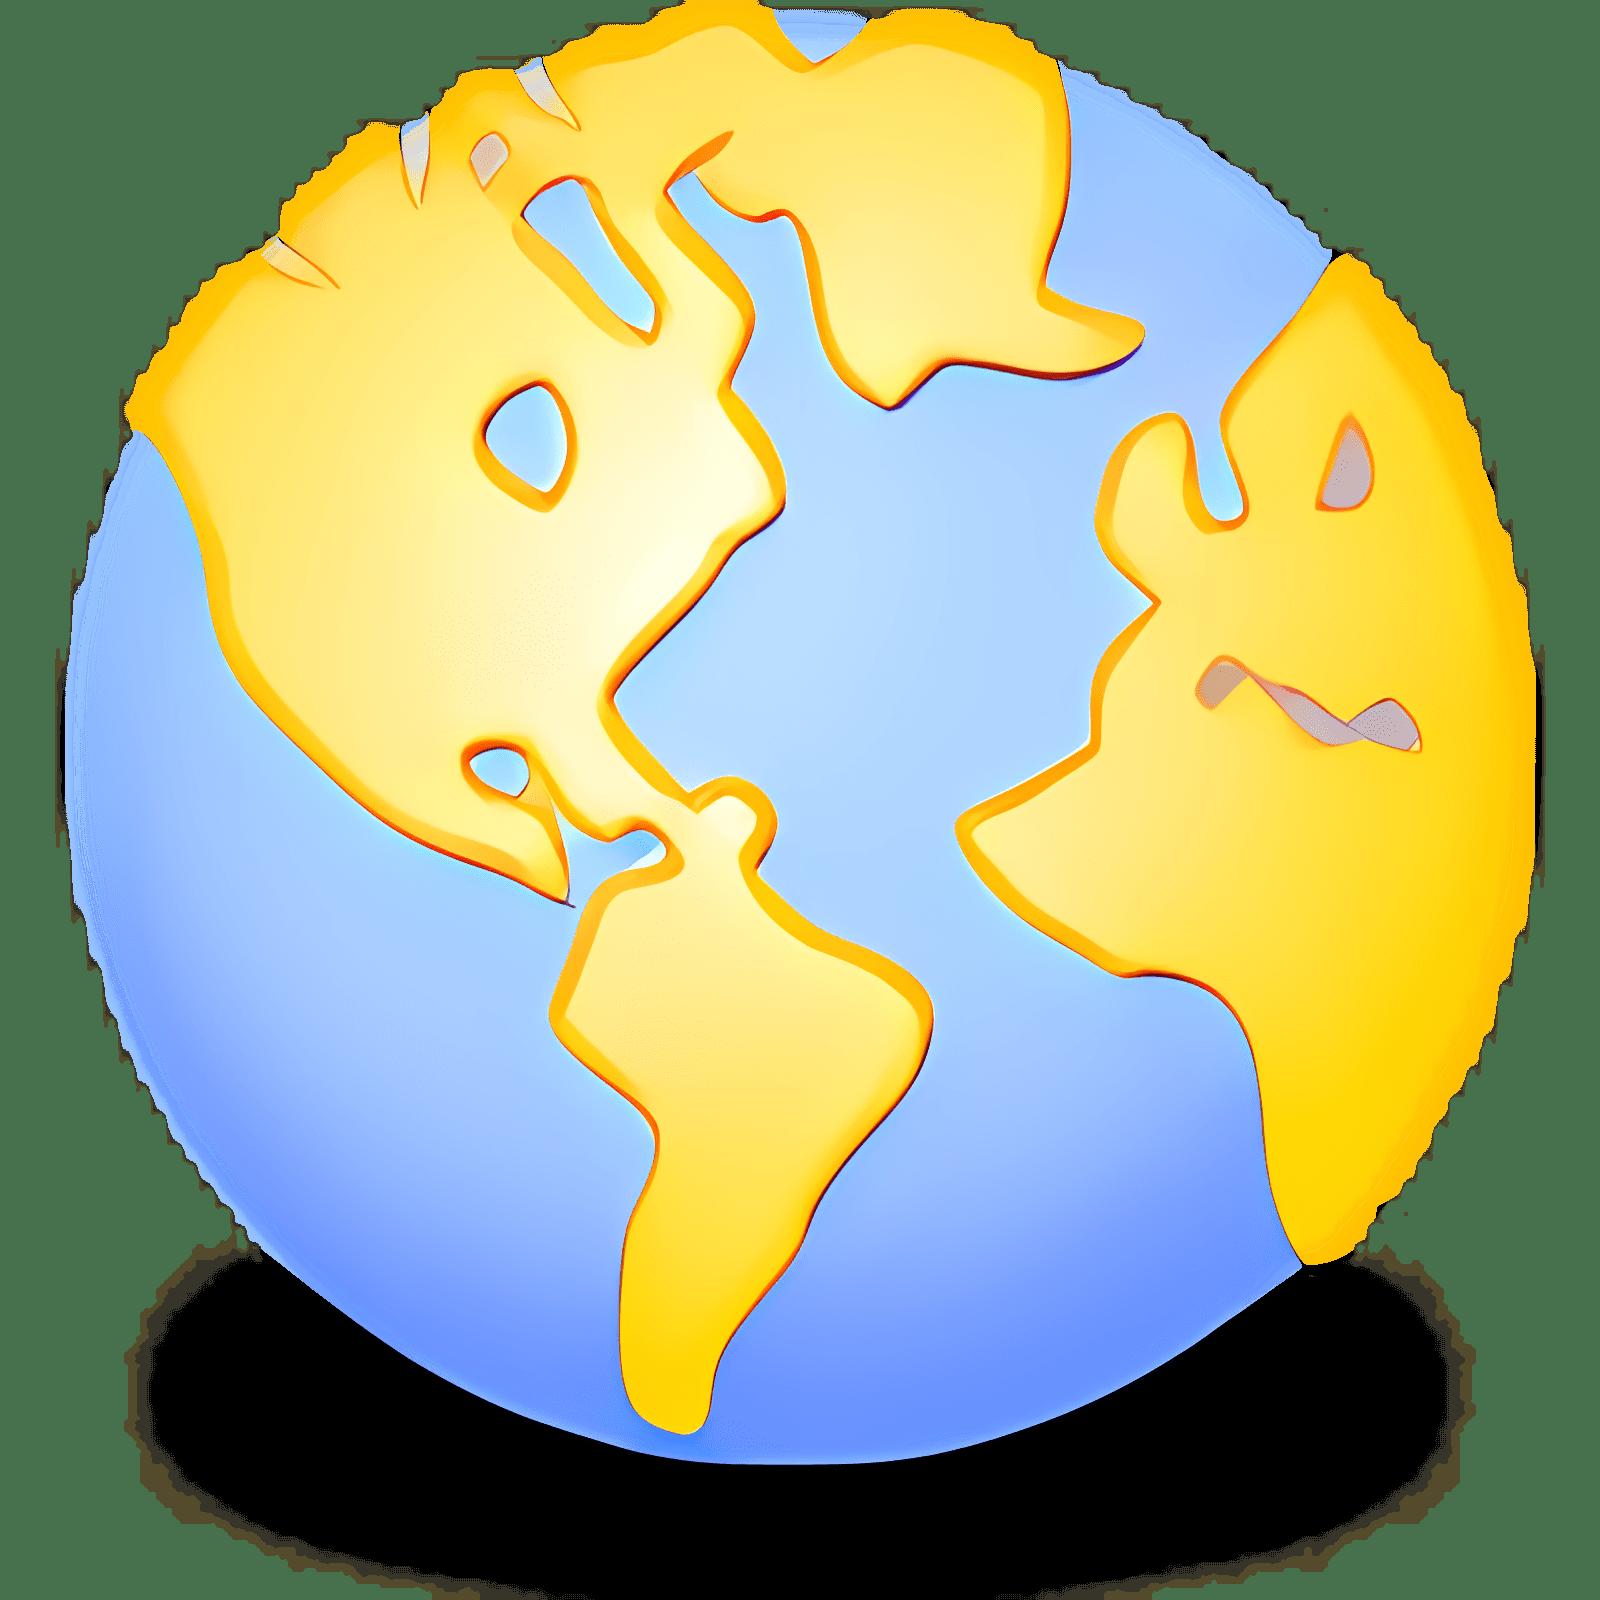 TerraClient 1.3.3